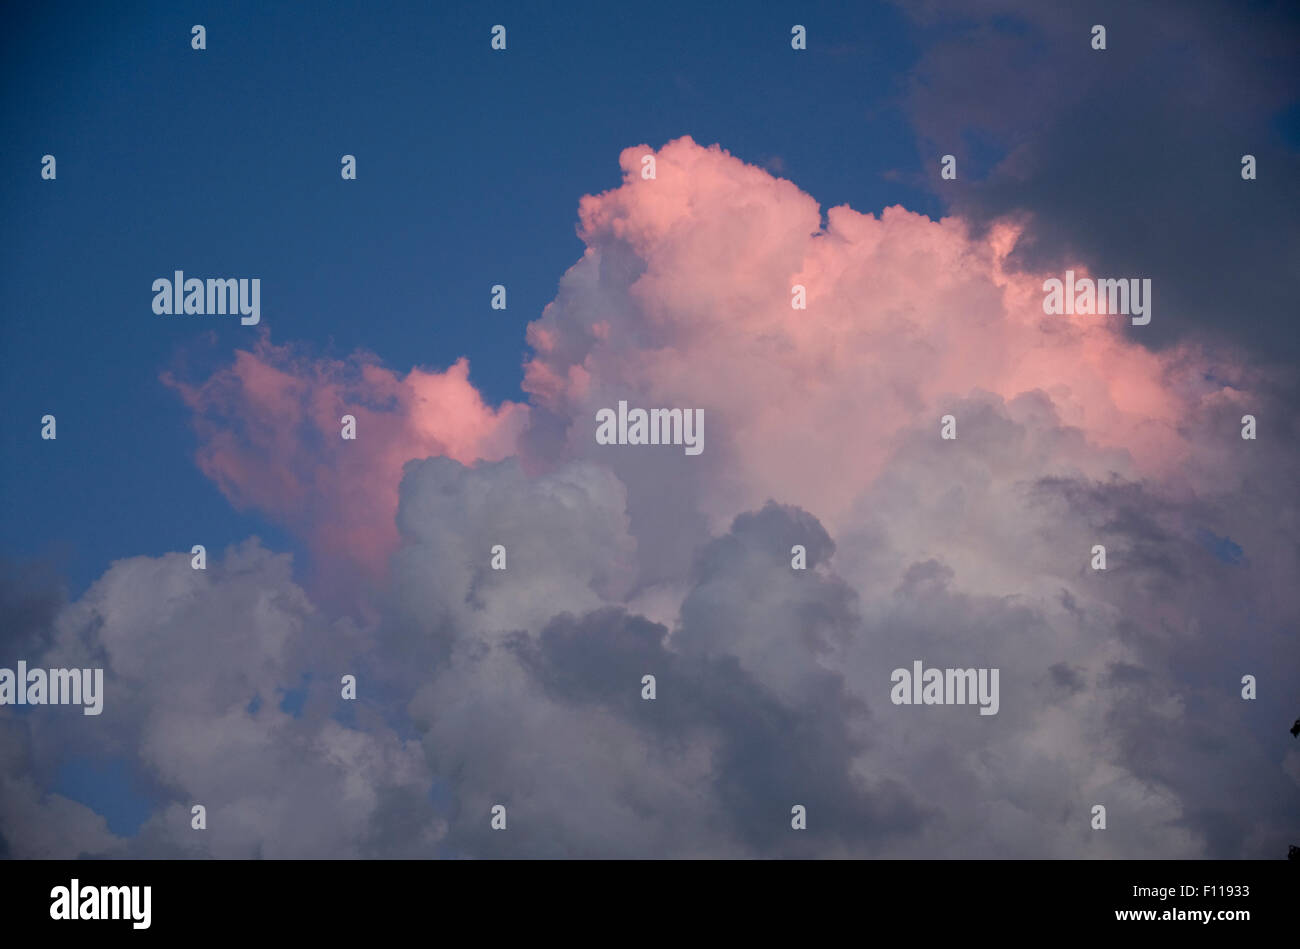 Midwestern storm Cumulonimbus calvus clouds in Indiana at sunset. - Stock Image